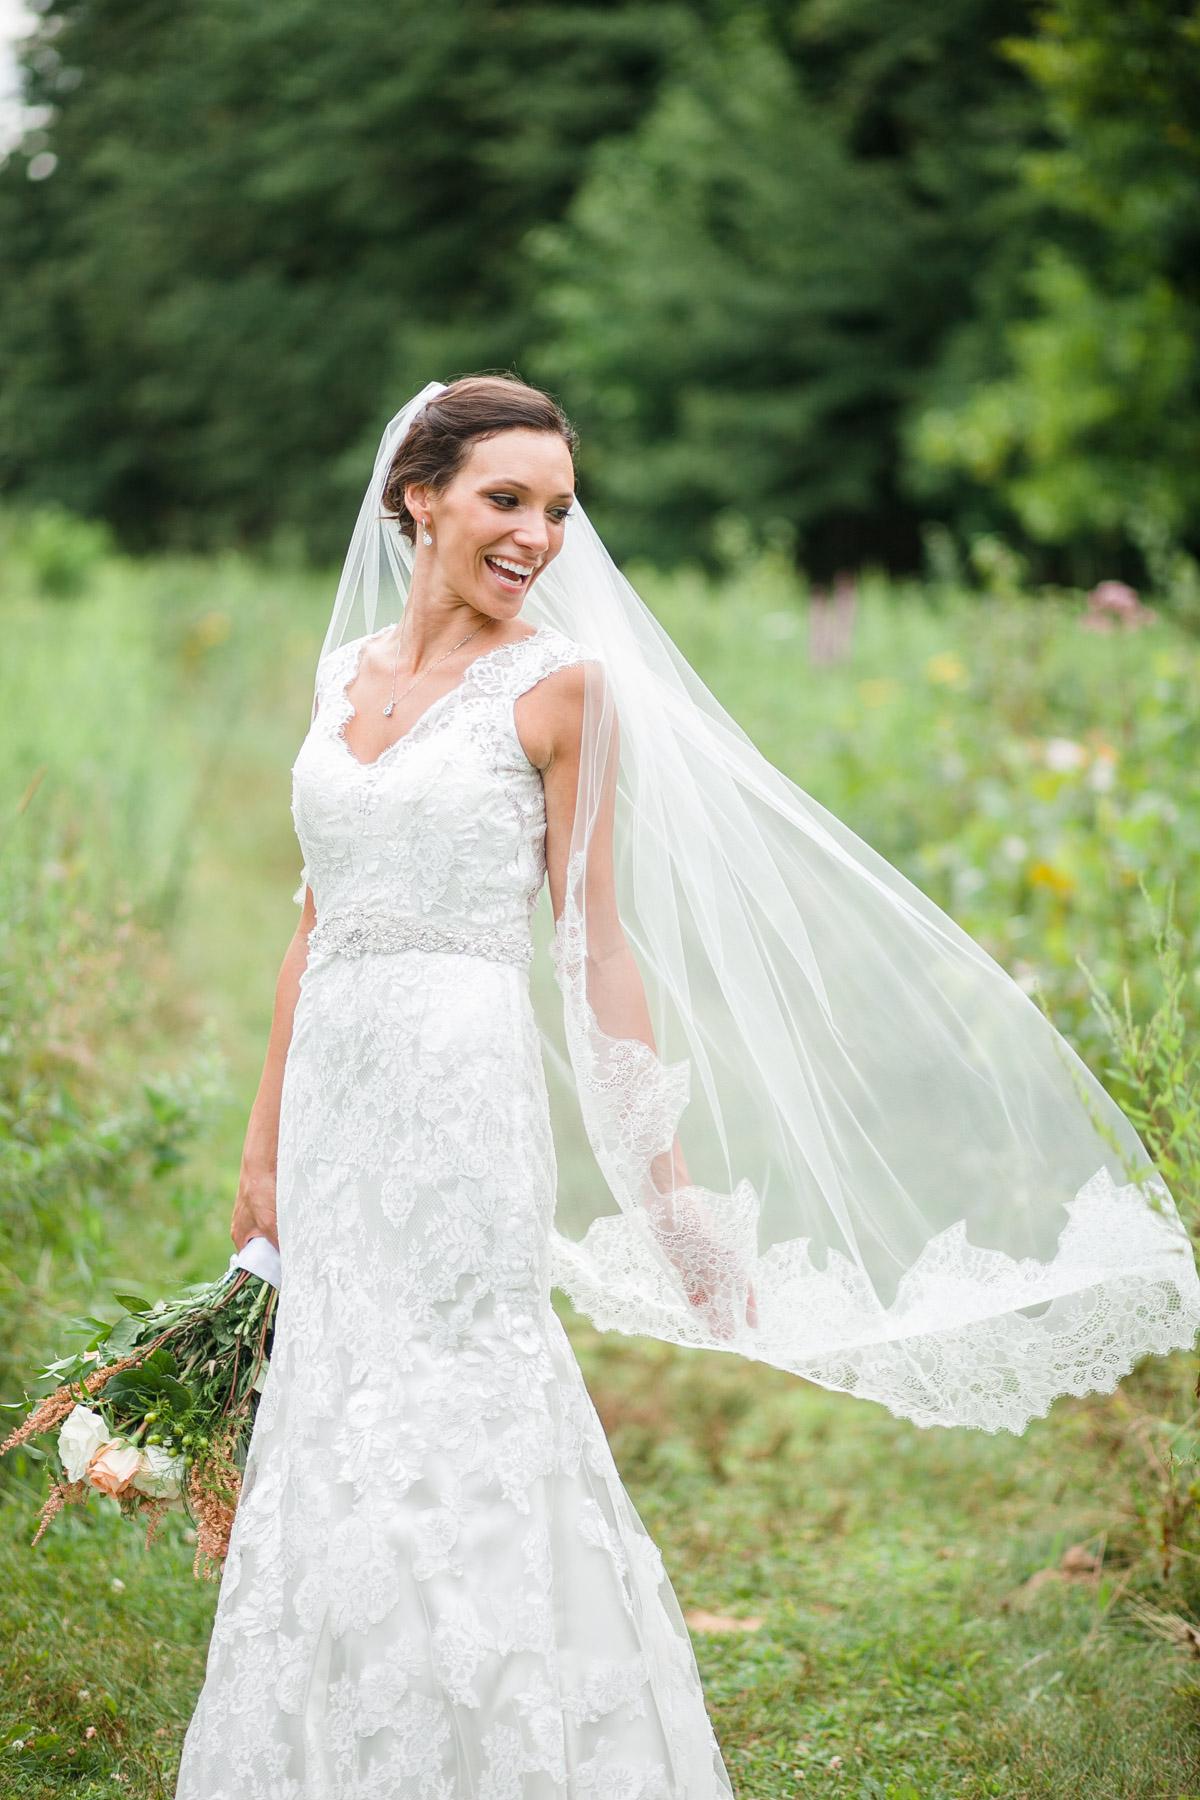 wildwood-park-wedding-photos-65.jpg